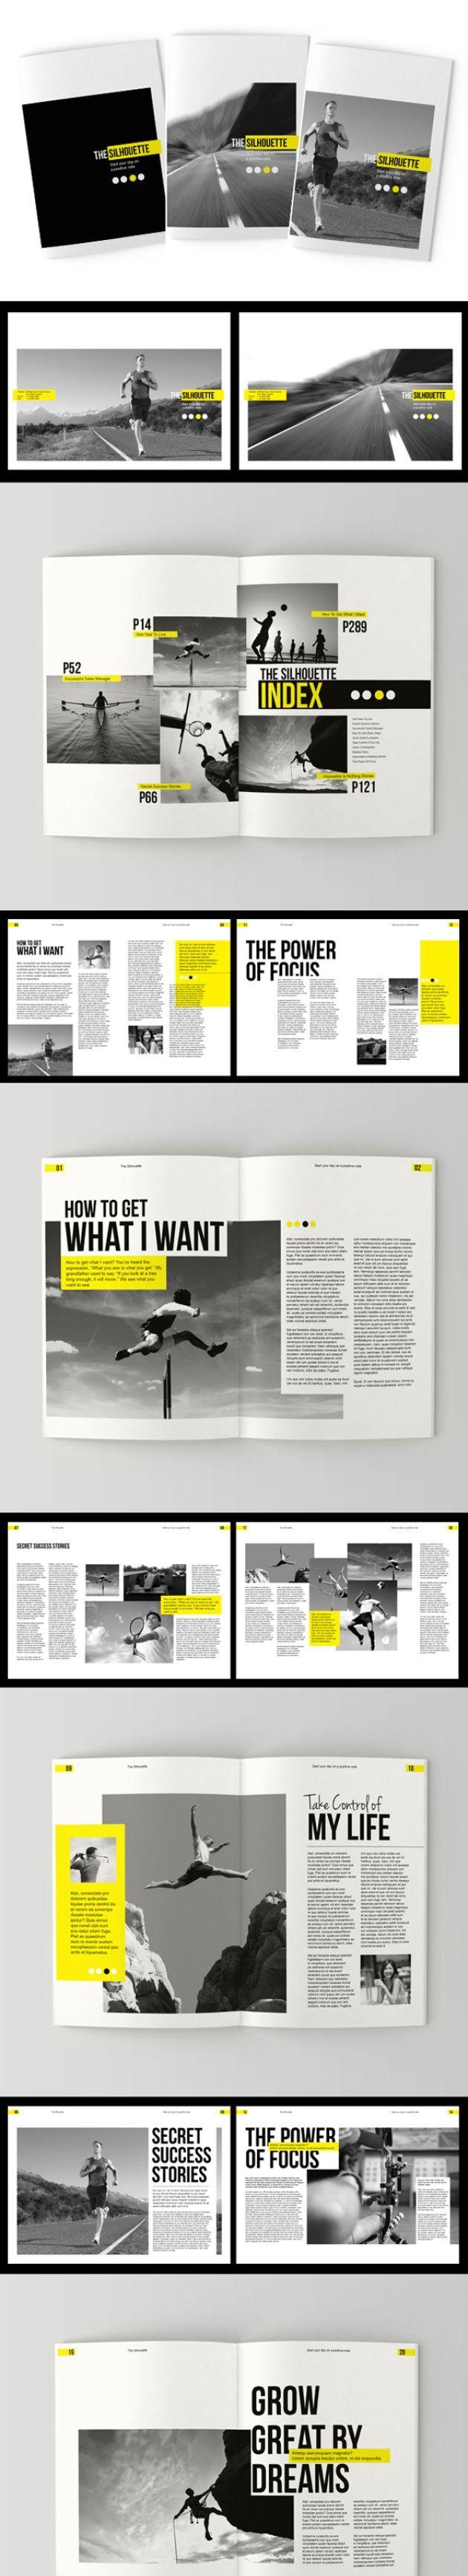 45+ Free Brochure Templates PSD Download | BlogSizzle: